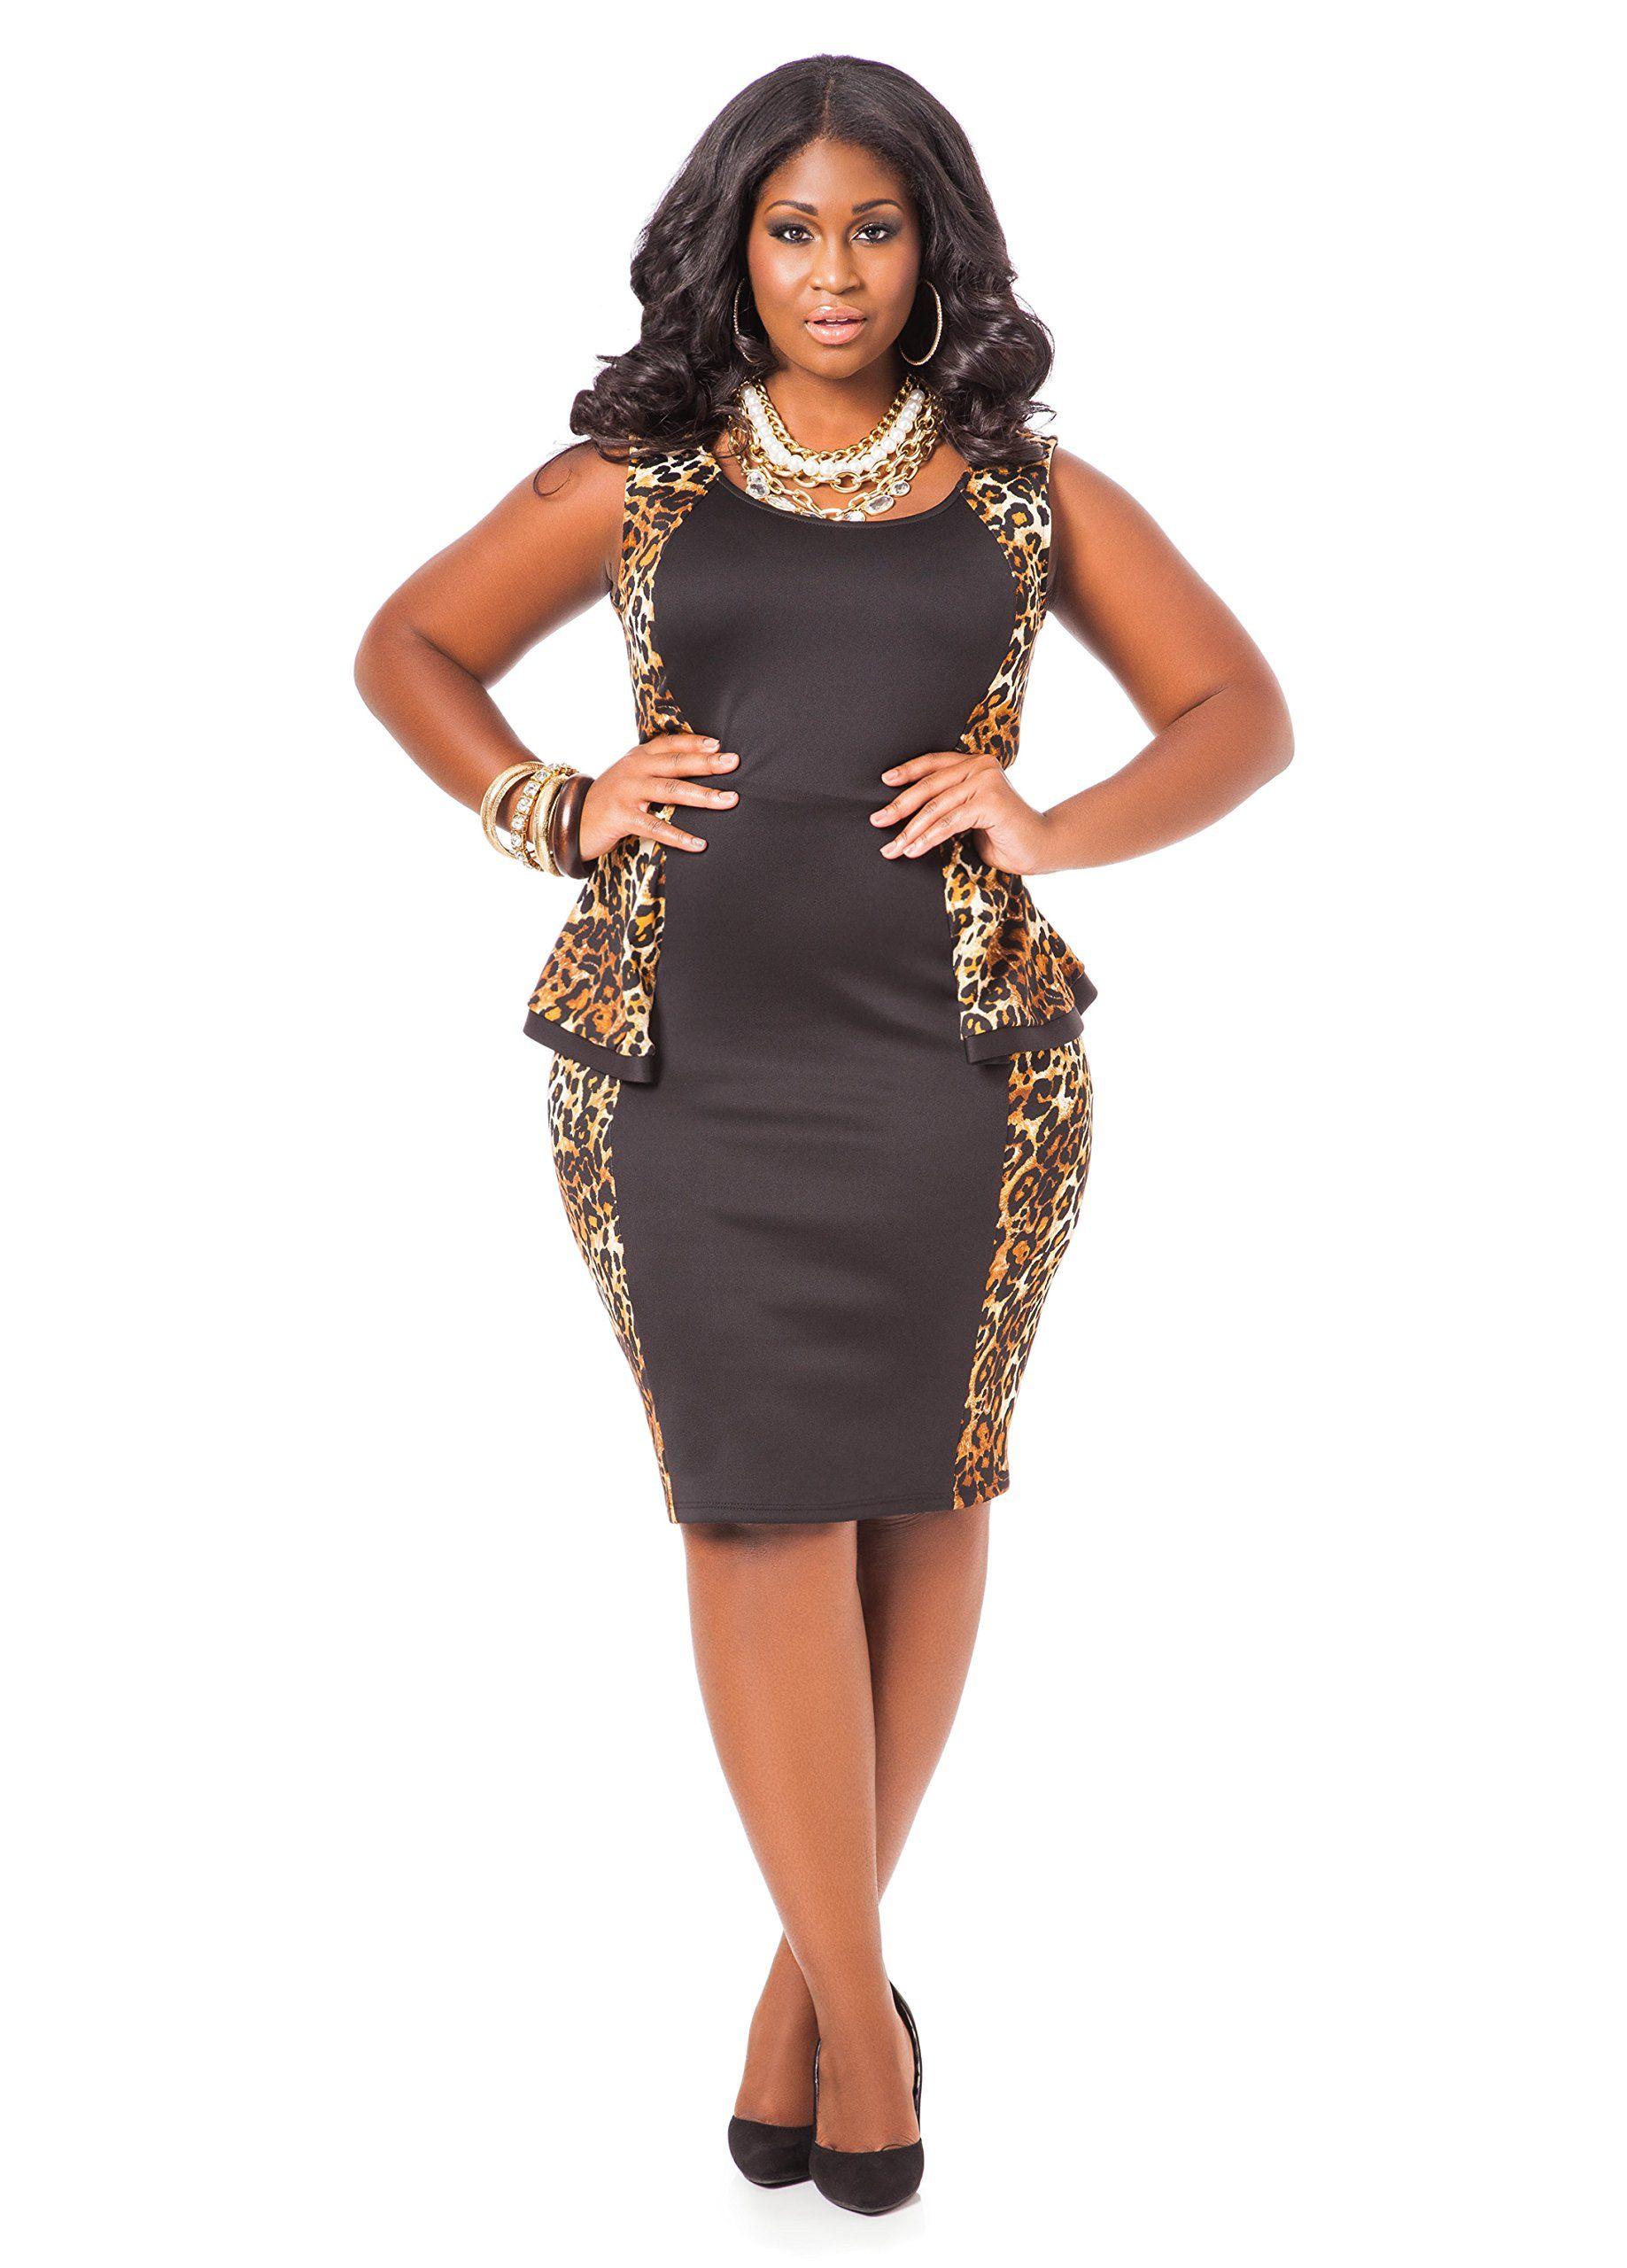 Ashley Stewart Women s Plus Size Leopard Print Colorblock Peplum Dress  Black 22 24 a13a9d926